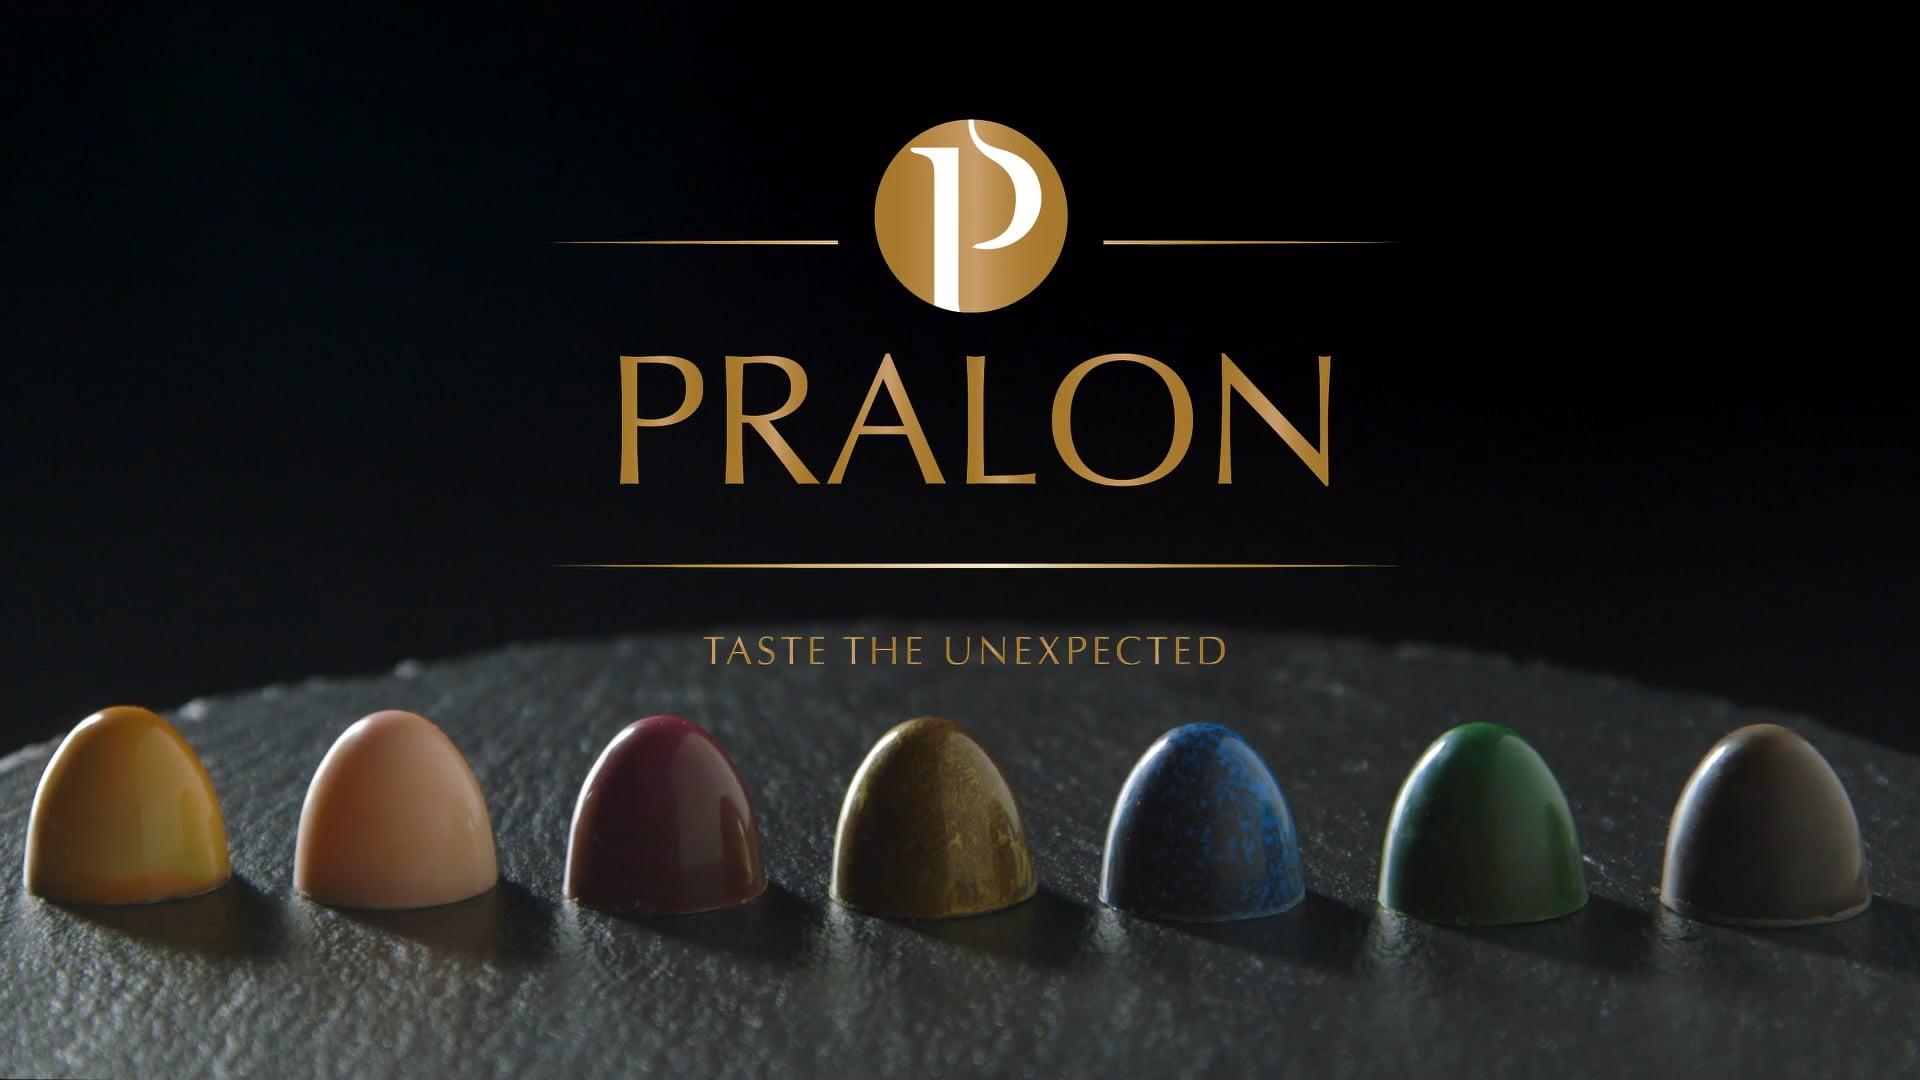 Pralon, chocolate commercial